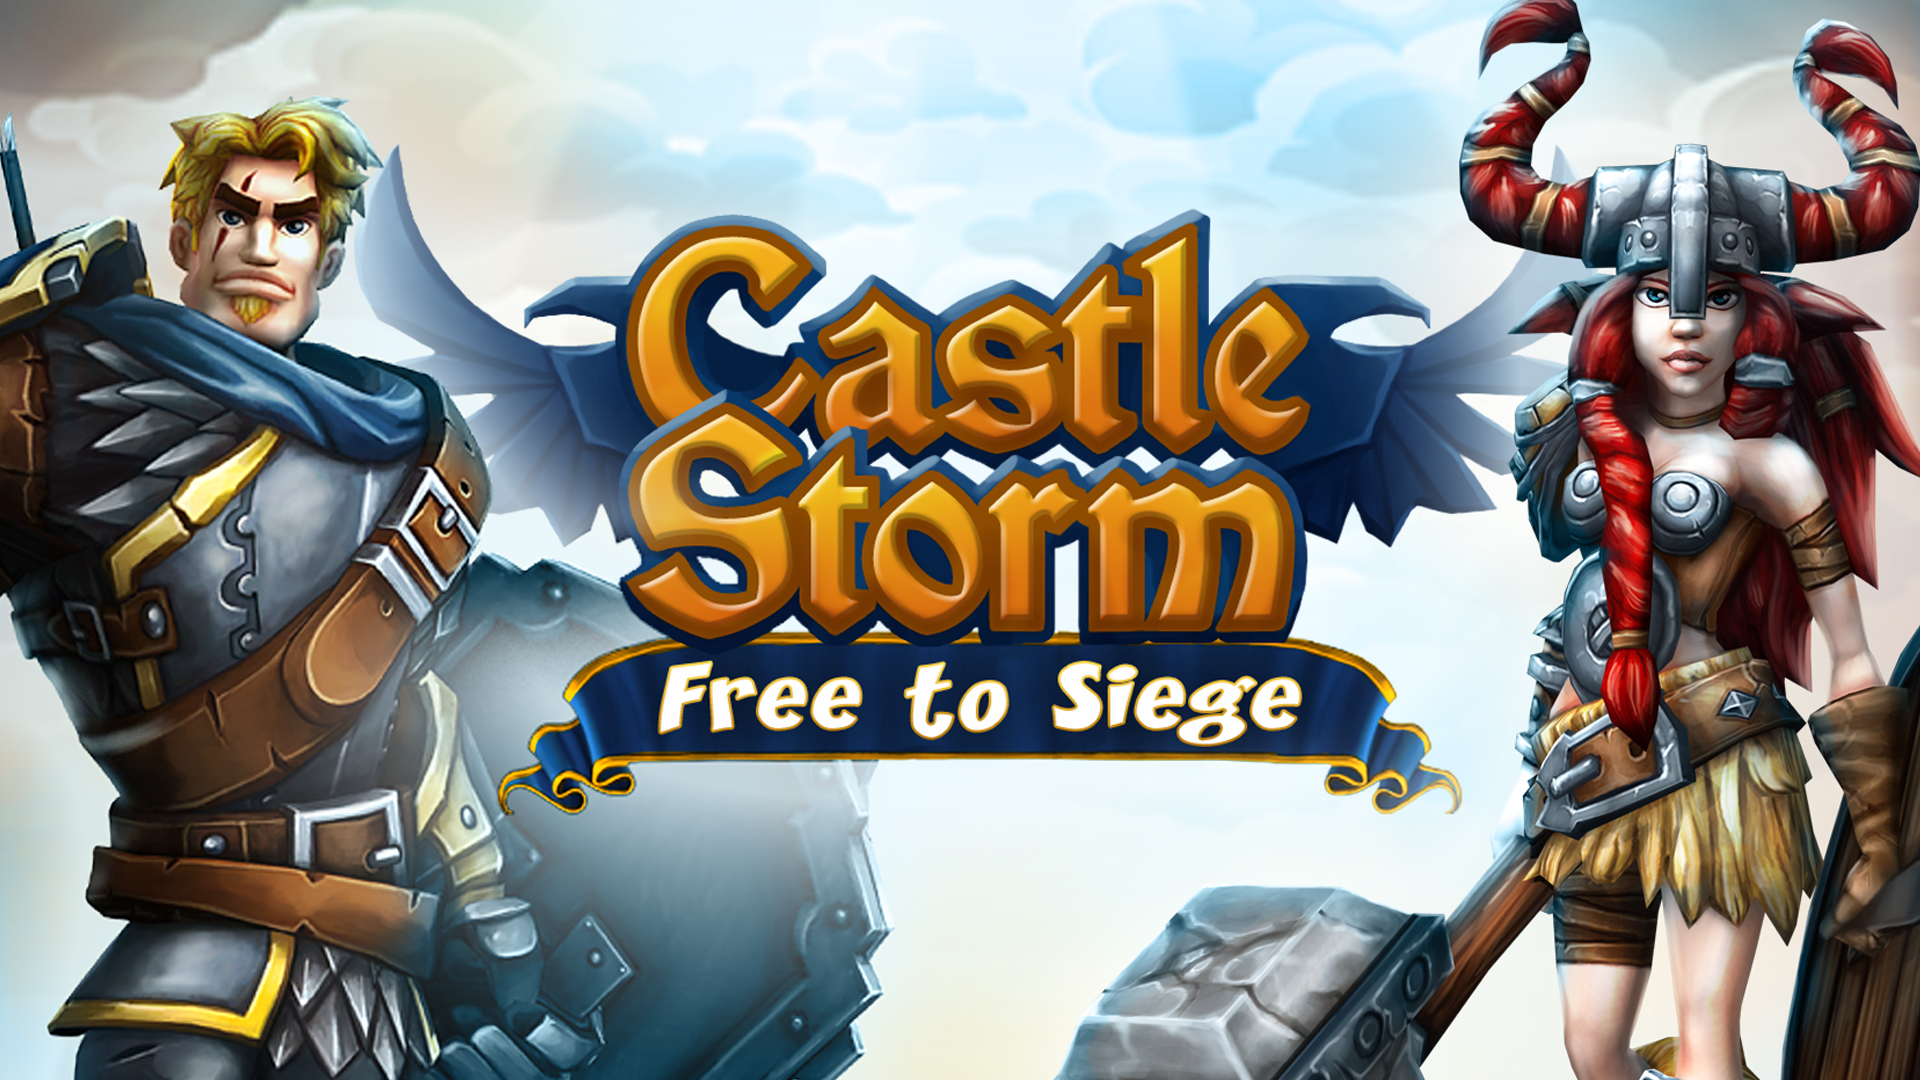 CastleStorm - Free to Siege screenshot #1